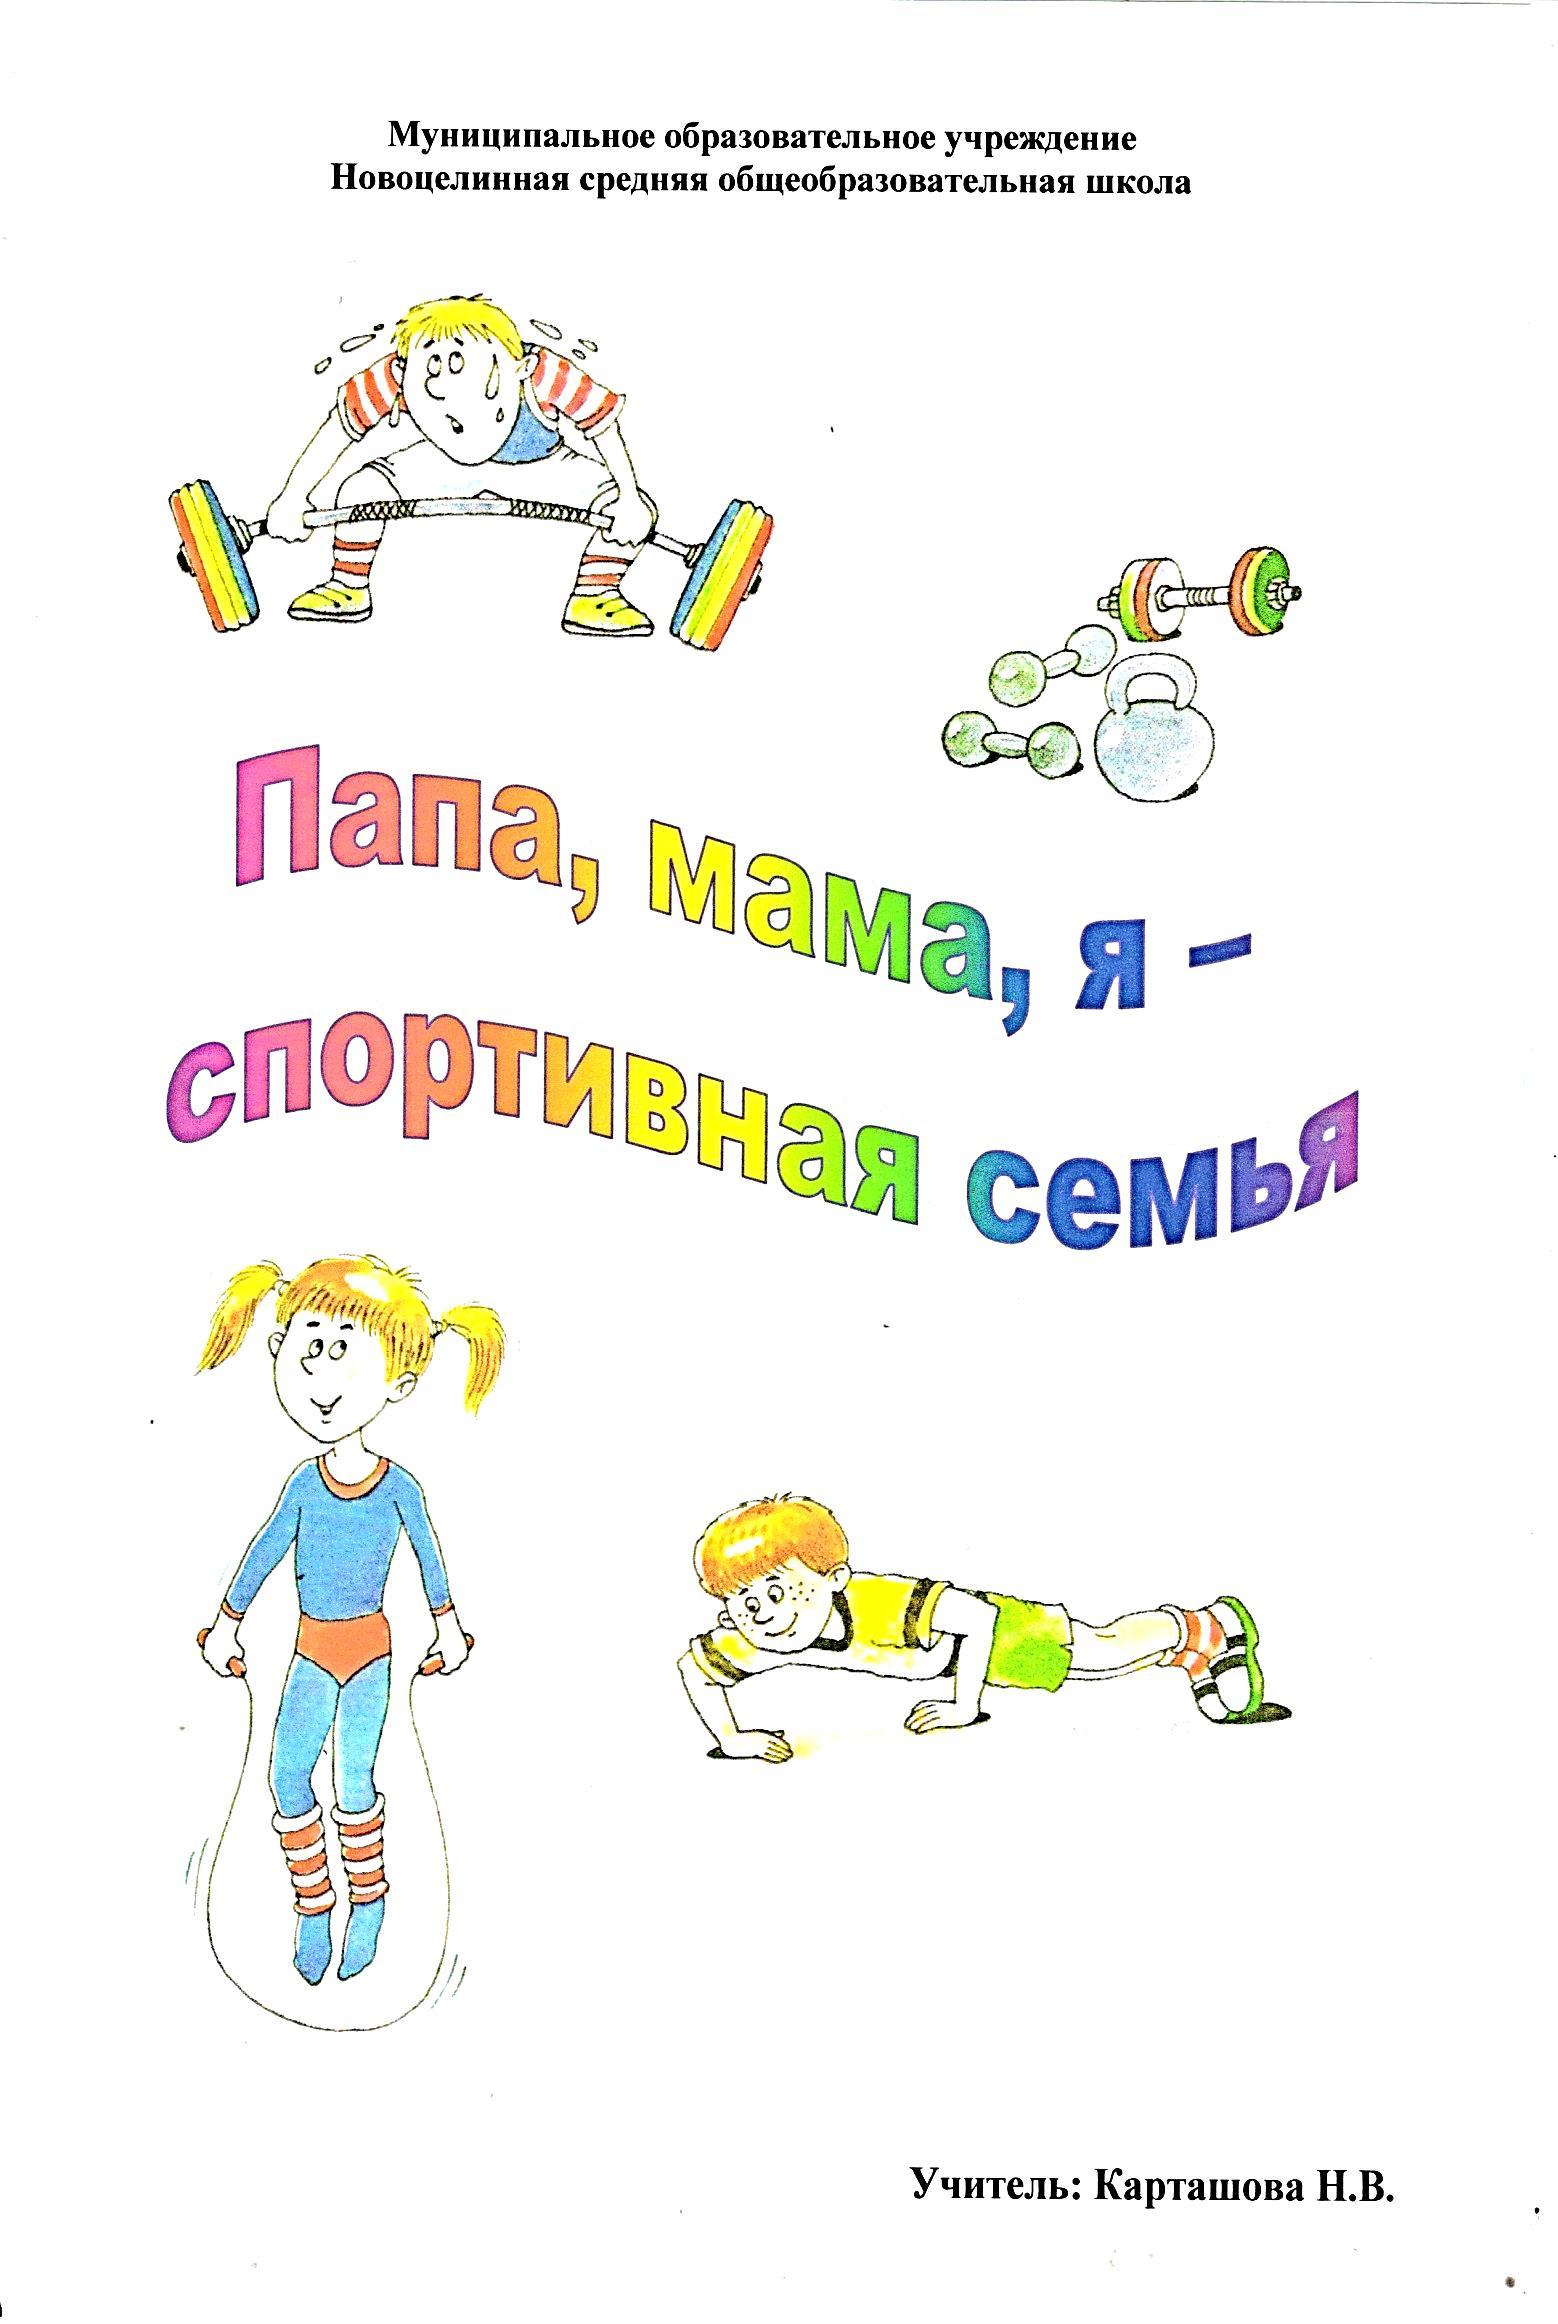 C:\Users\Наталия\Desktop\ПМЯ.jpeg